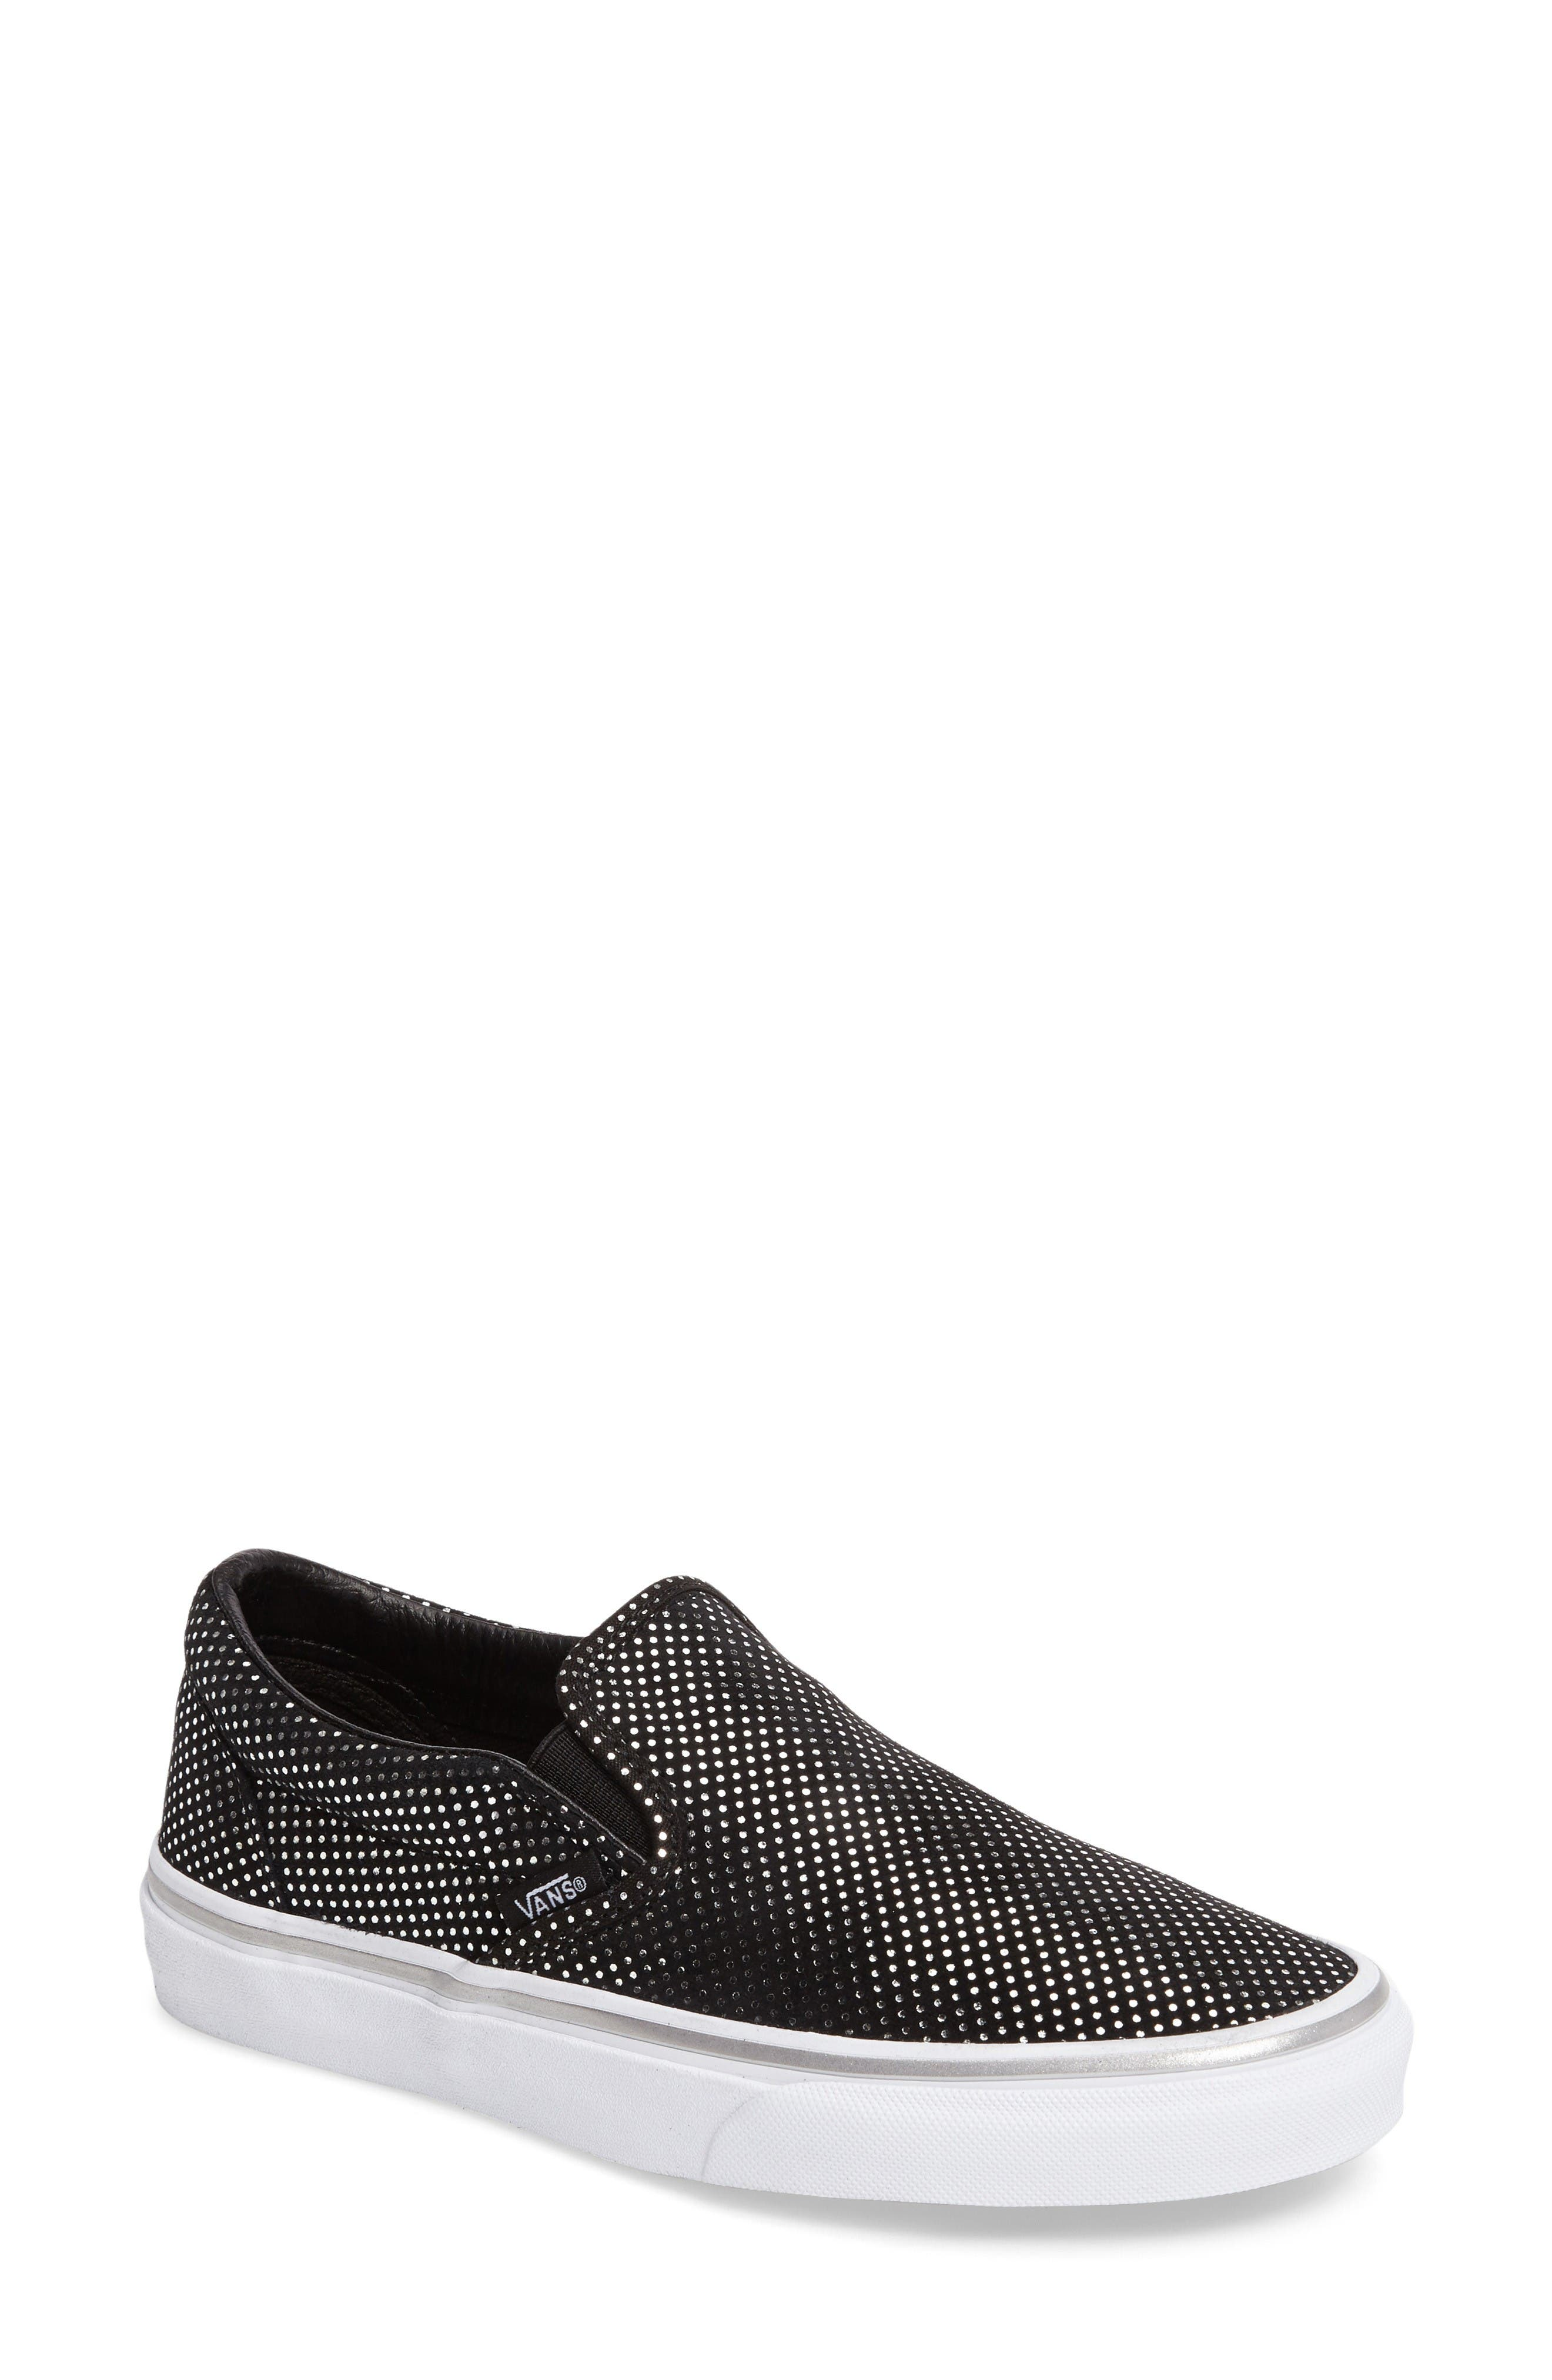 Classic Slip-On Sneaker,                             Main thumbnail 1, color,                             Metallic Dots Silver/ Black